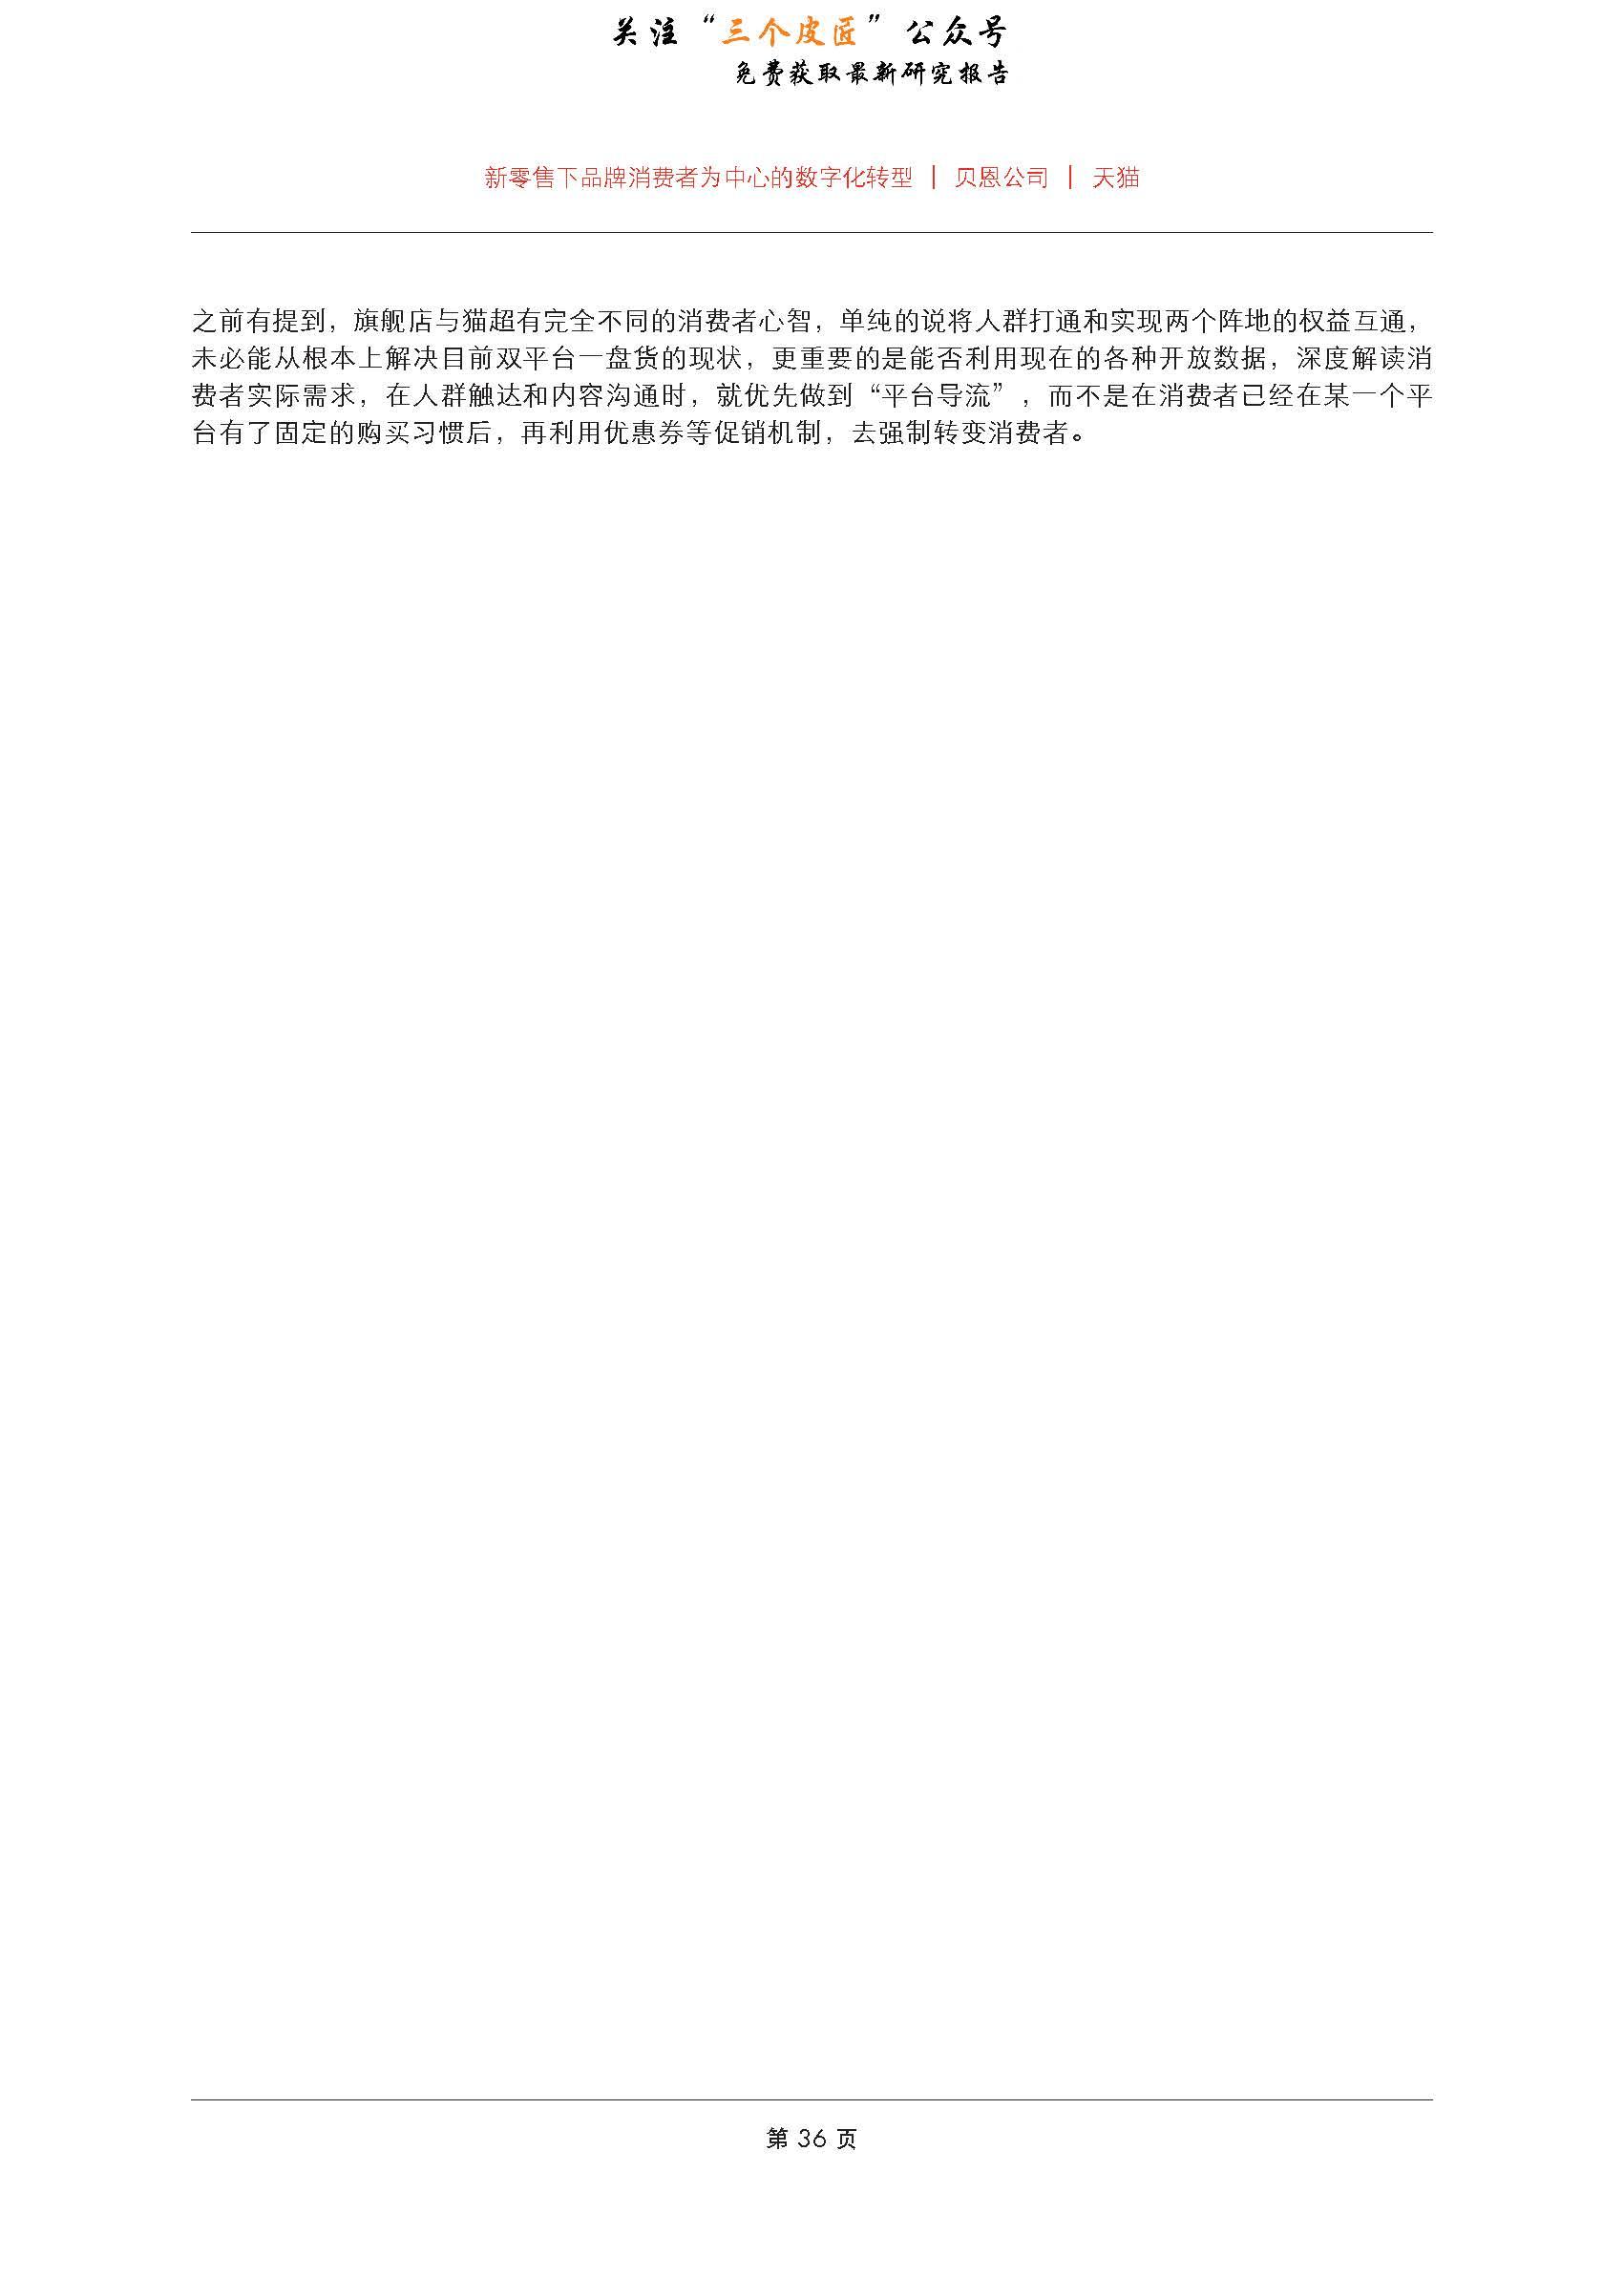 1_Page_38.jpg